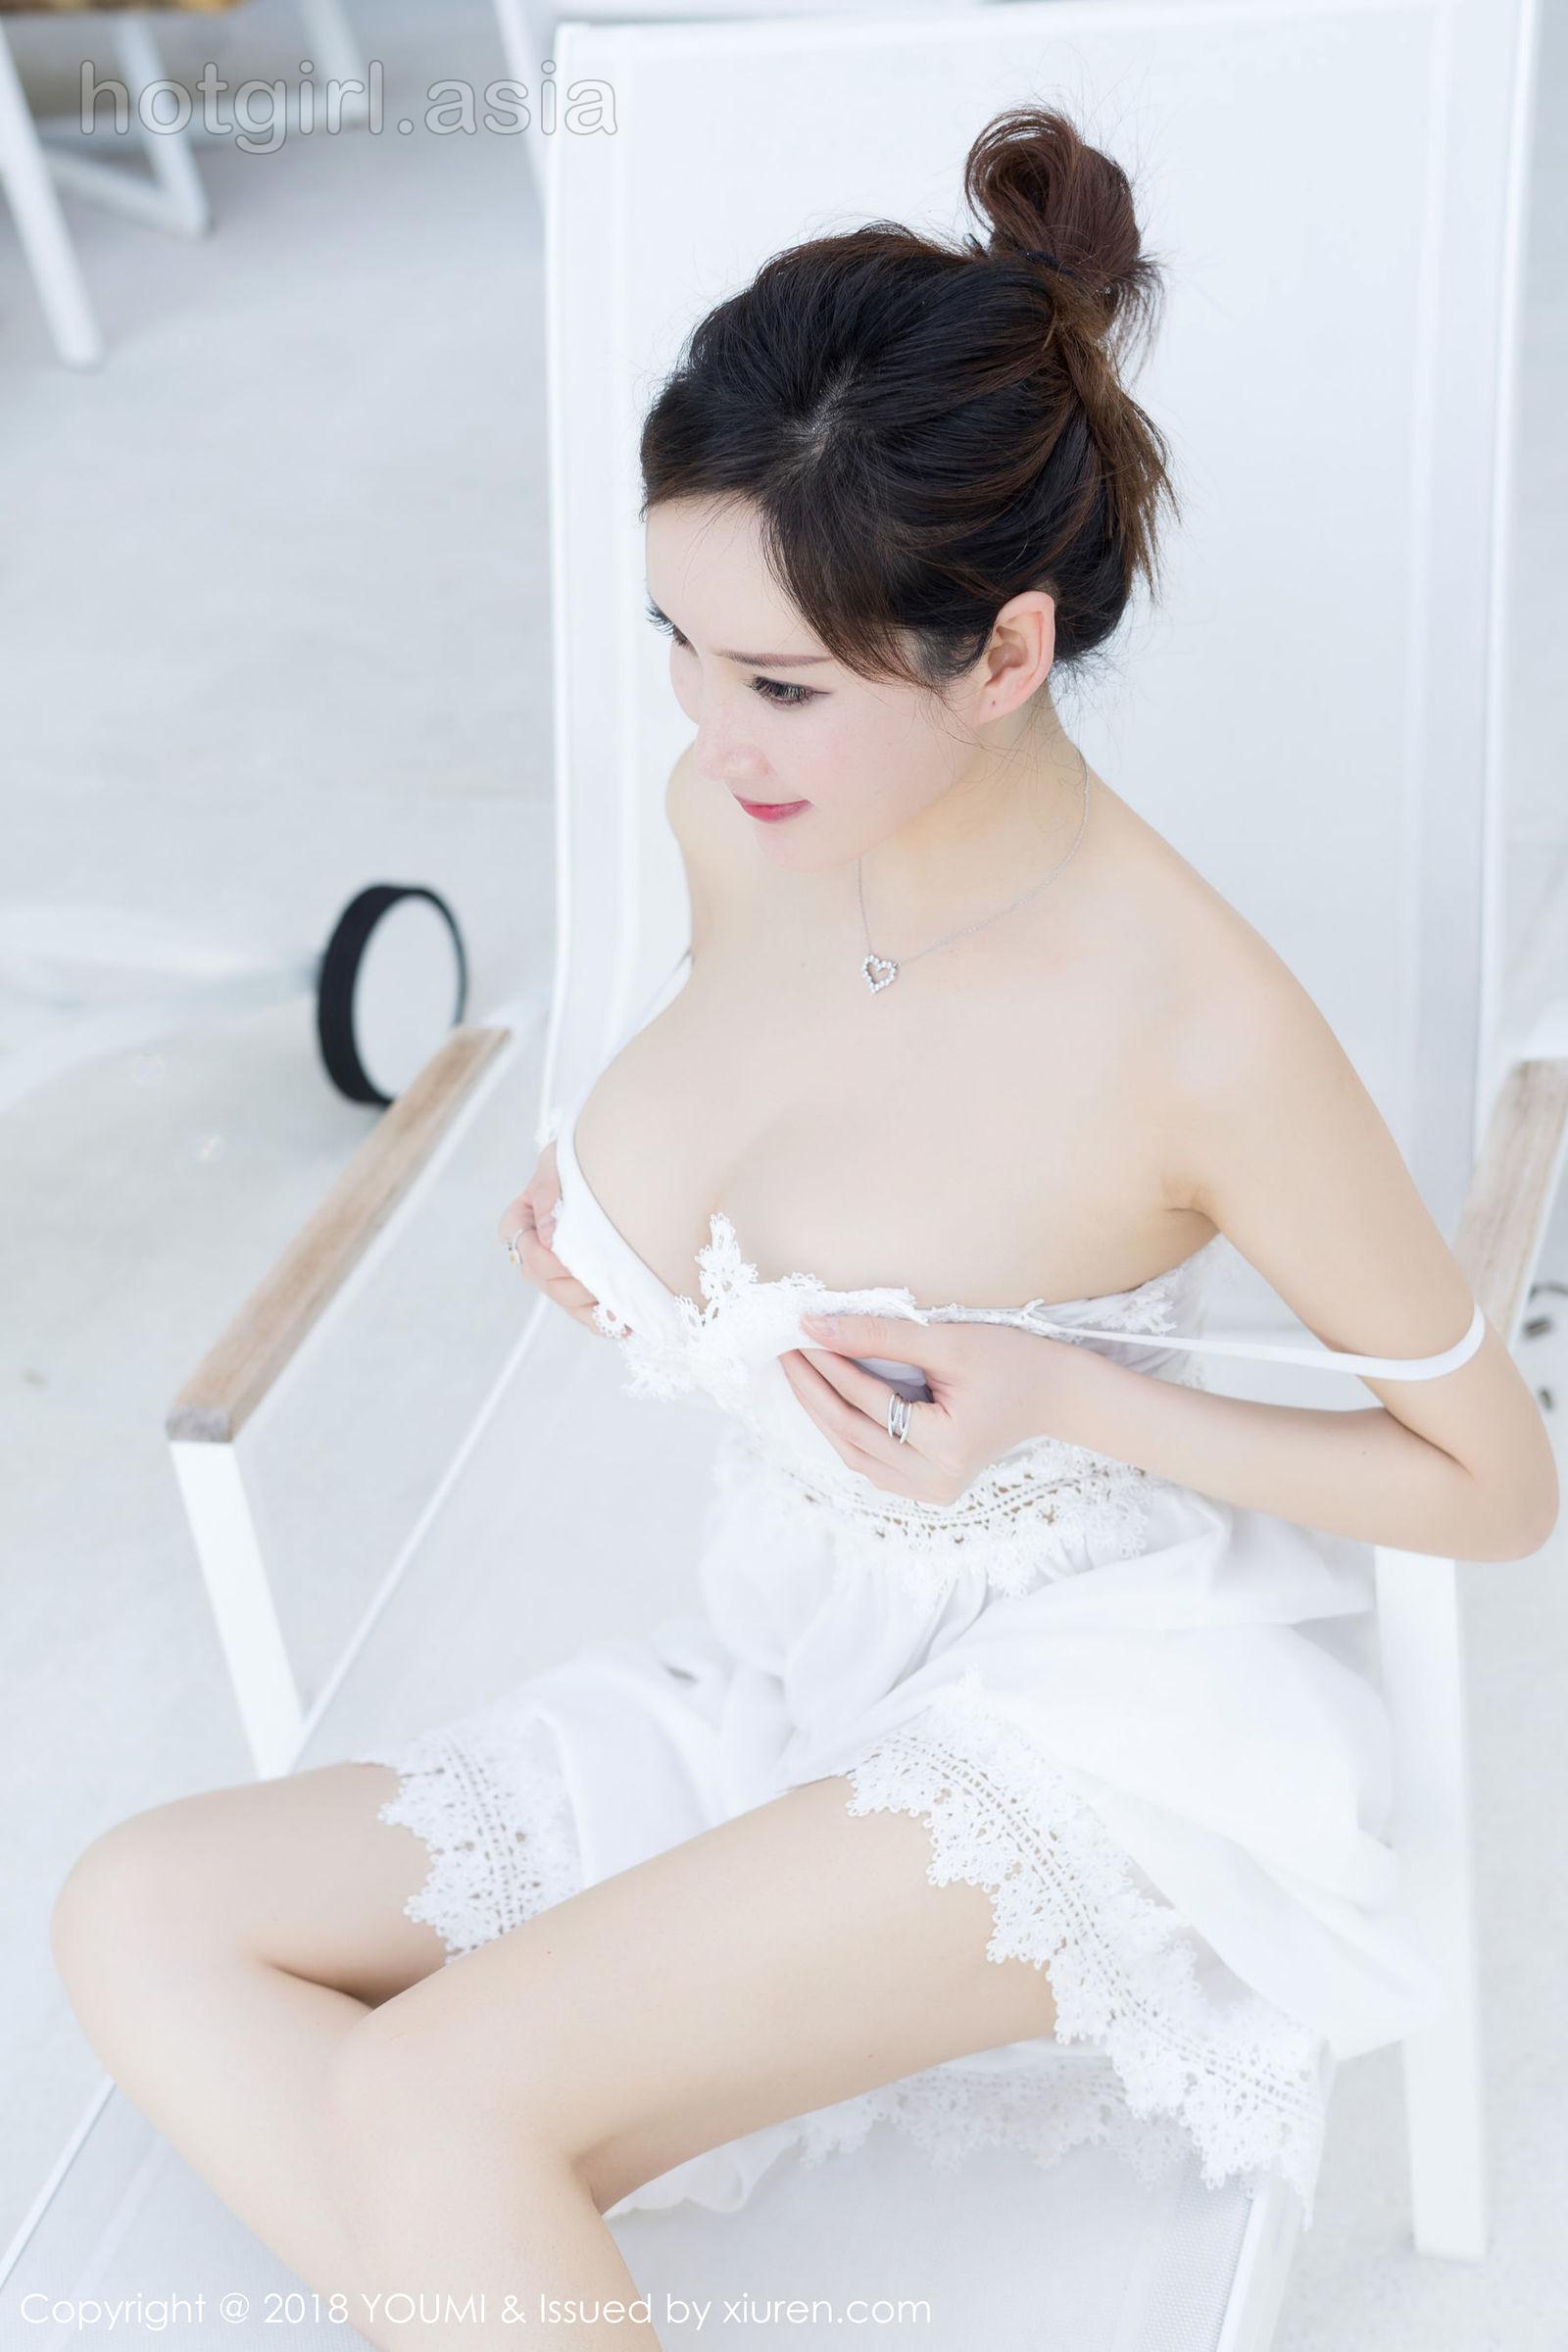 [YouMi 尤 蜜 荟] Vol.168 Dofei Round Short Frustration Ugly Black Poor-Stockings Charm Photo Set